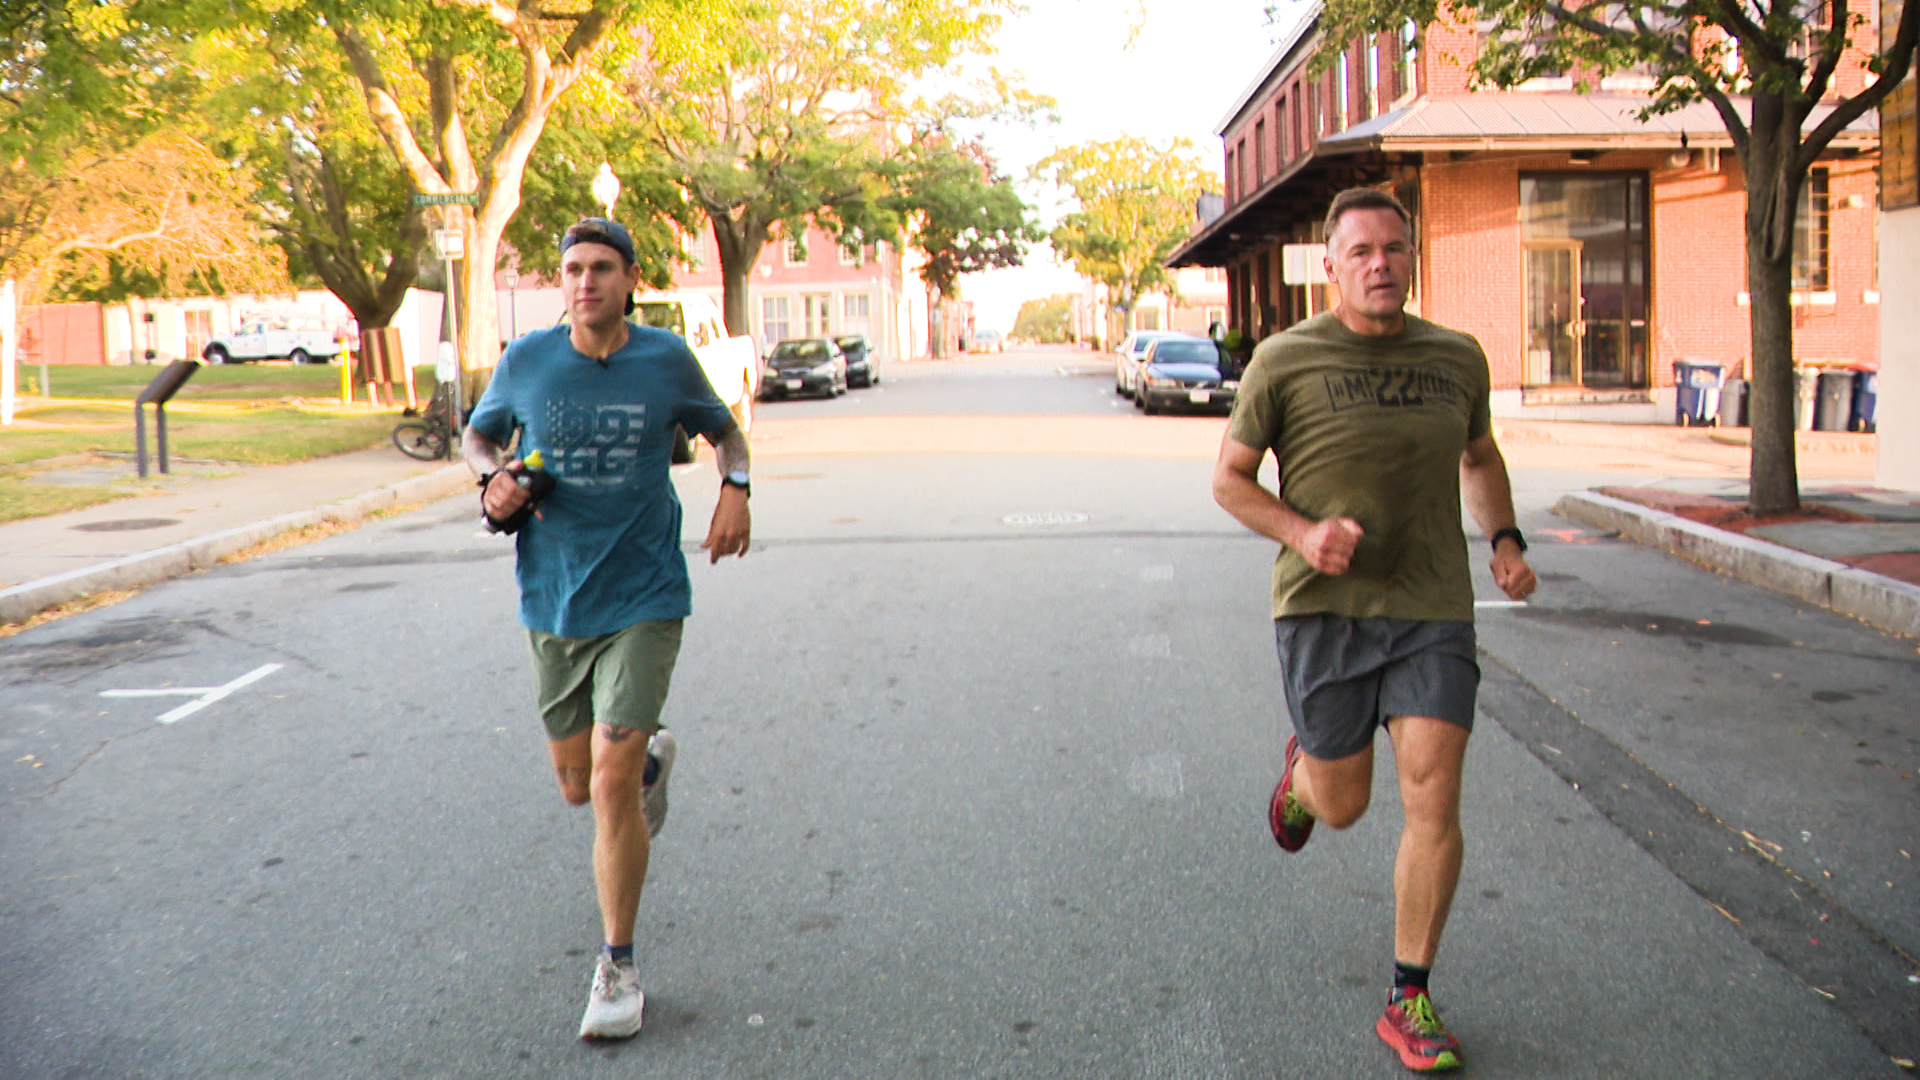 2 men running 500 miles for veteran suicide awareness | WPRI.com